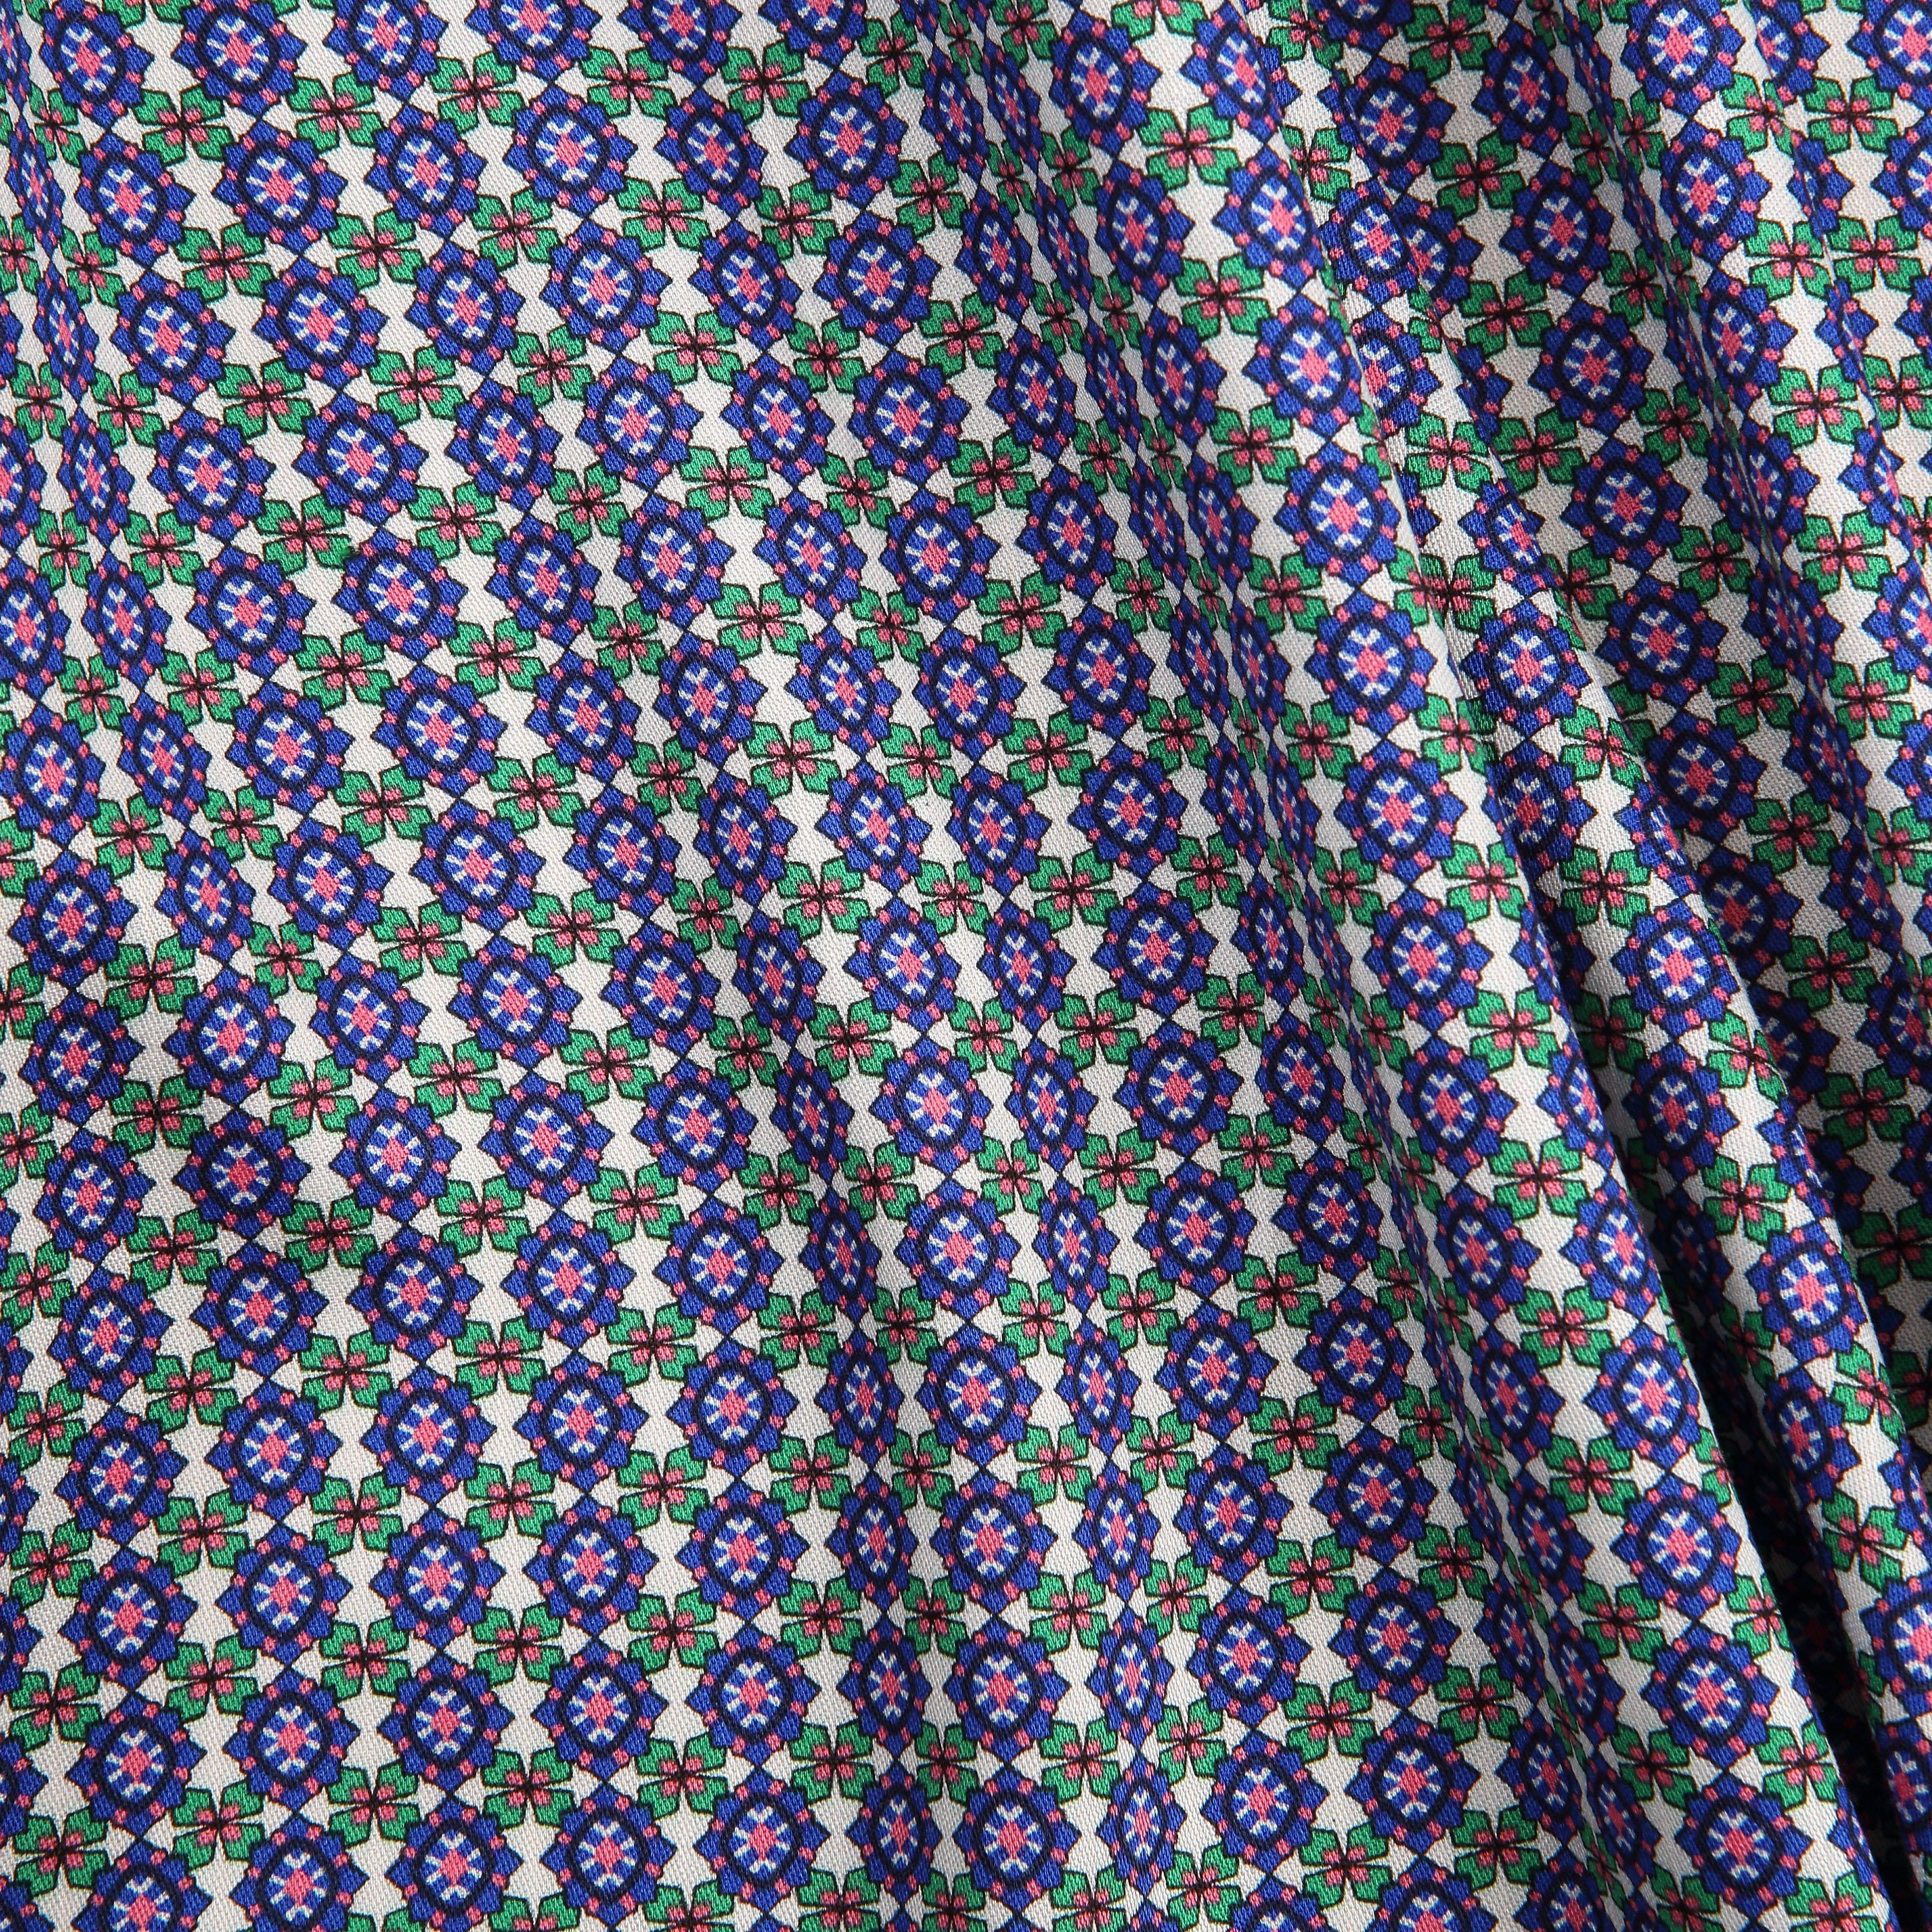 geometric-viscose-print-bloomsbury-square-fabrics-2508